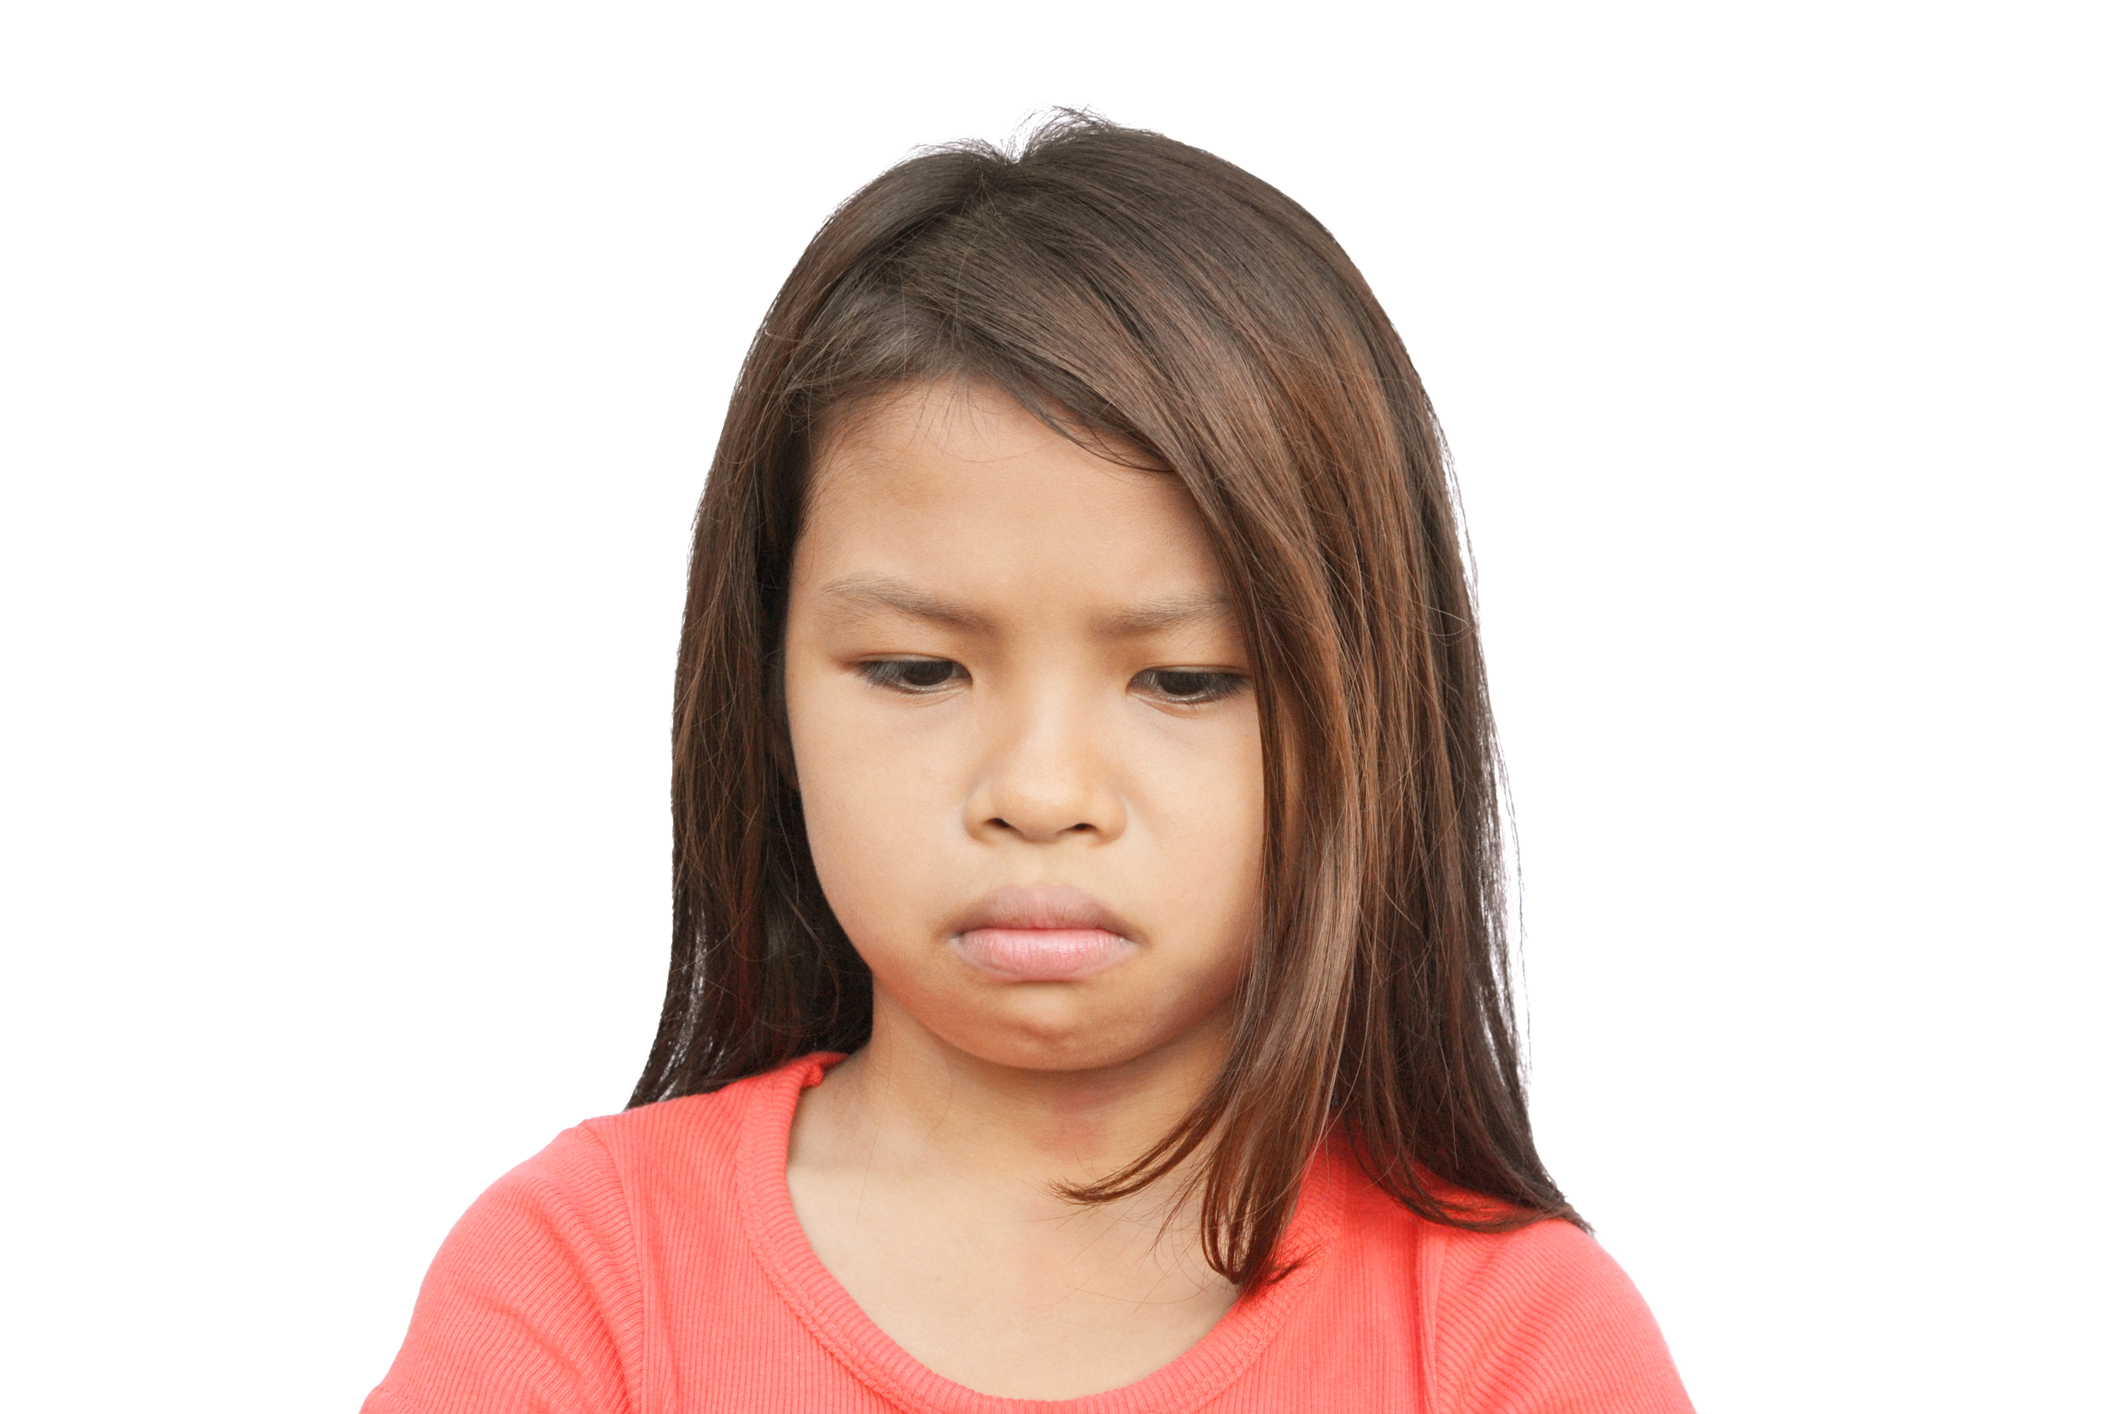 Når dit barn ikke bliver forstået 2